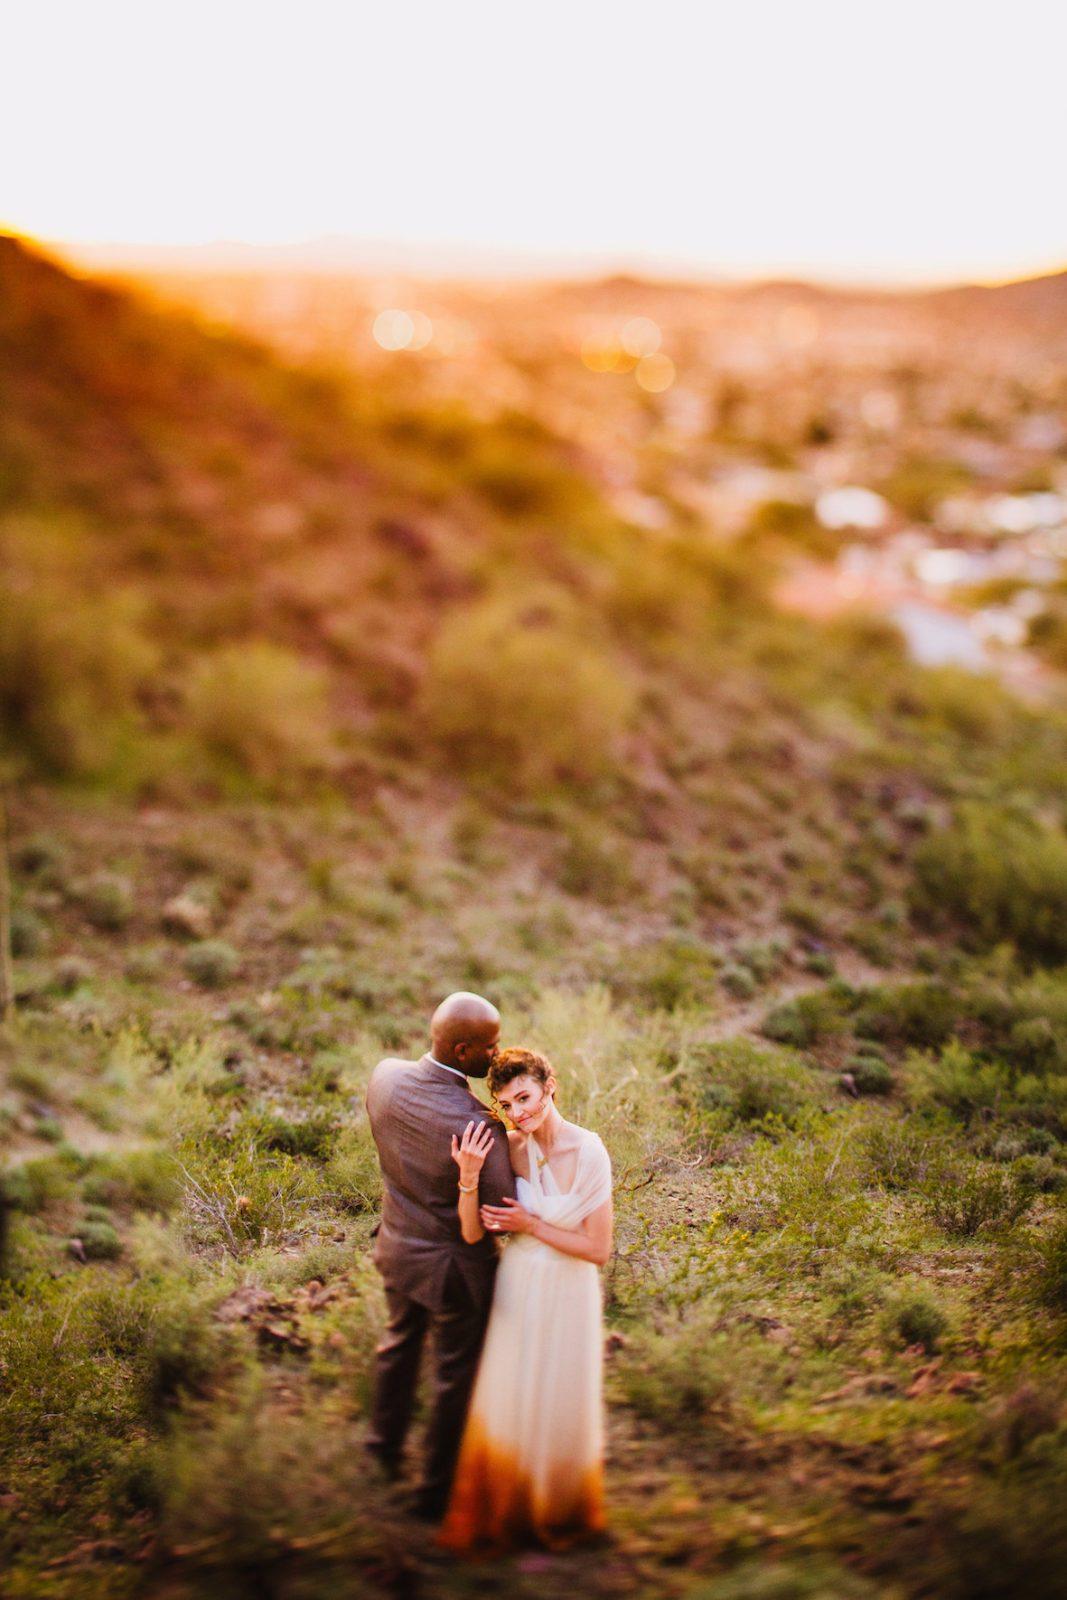 Bridal styled shoot in the Arizona desert ~ Orange Dip dye wedding dress Bridal styled shoot in the Arizona desert ~ Orange Dip dye wedding dress